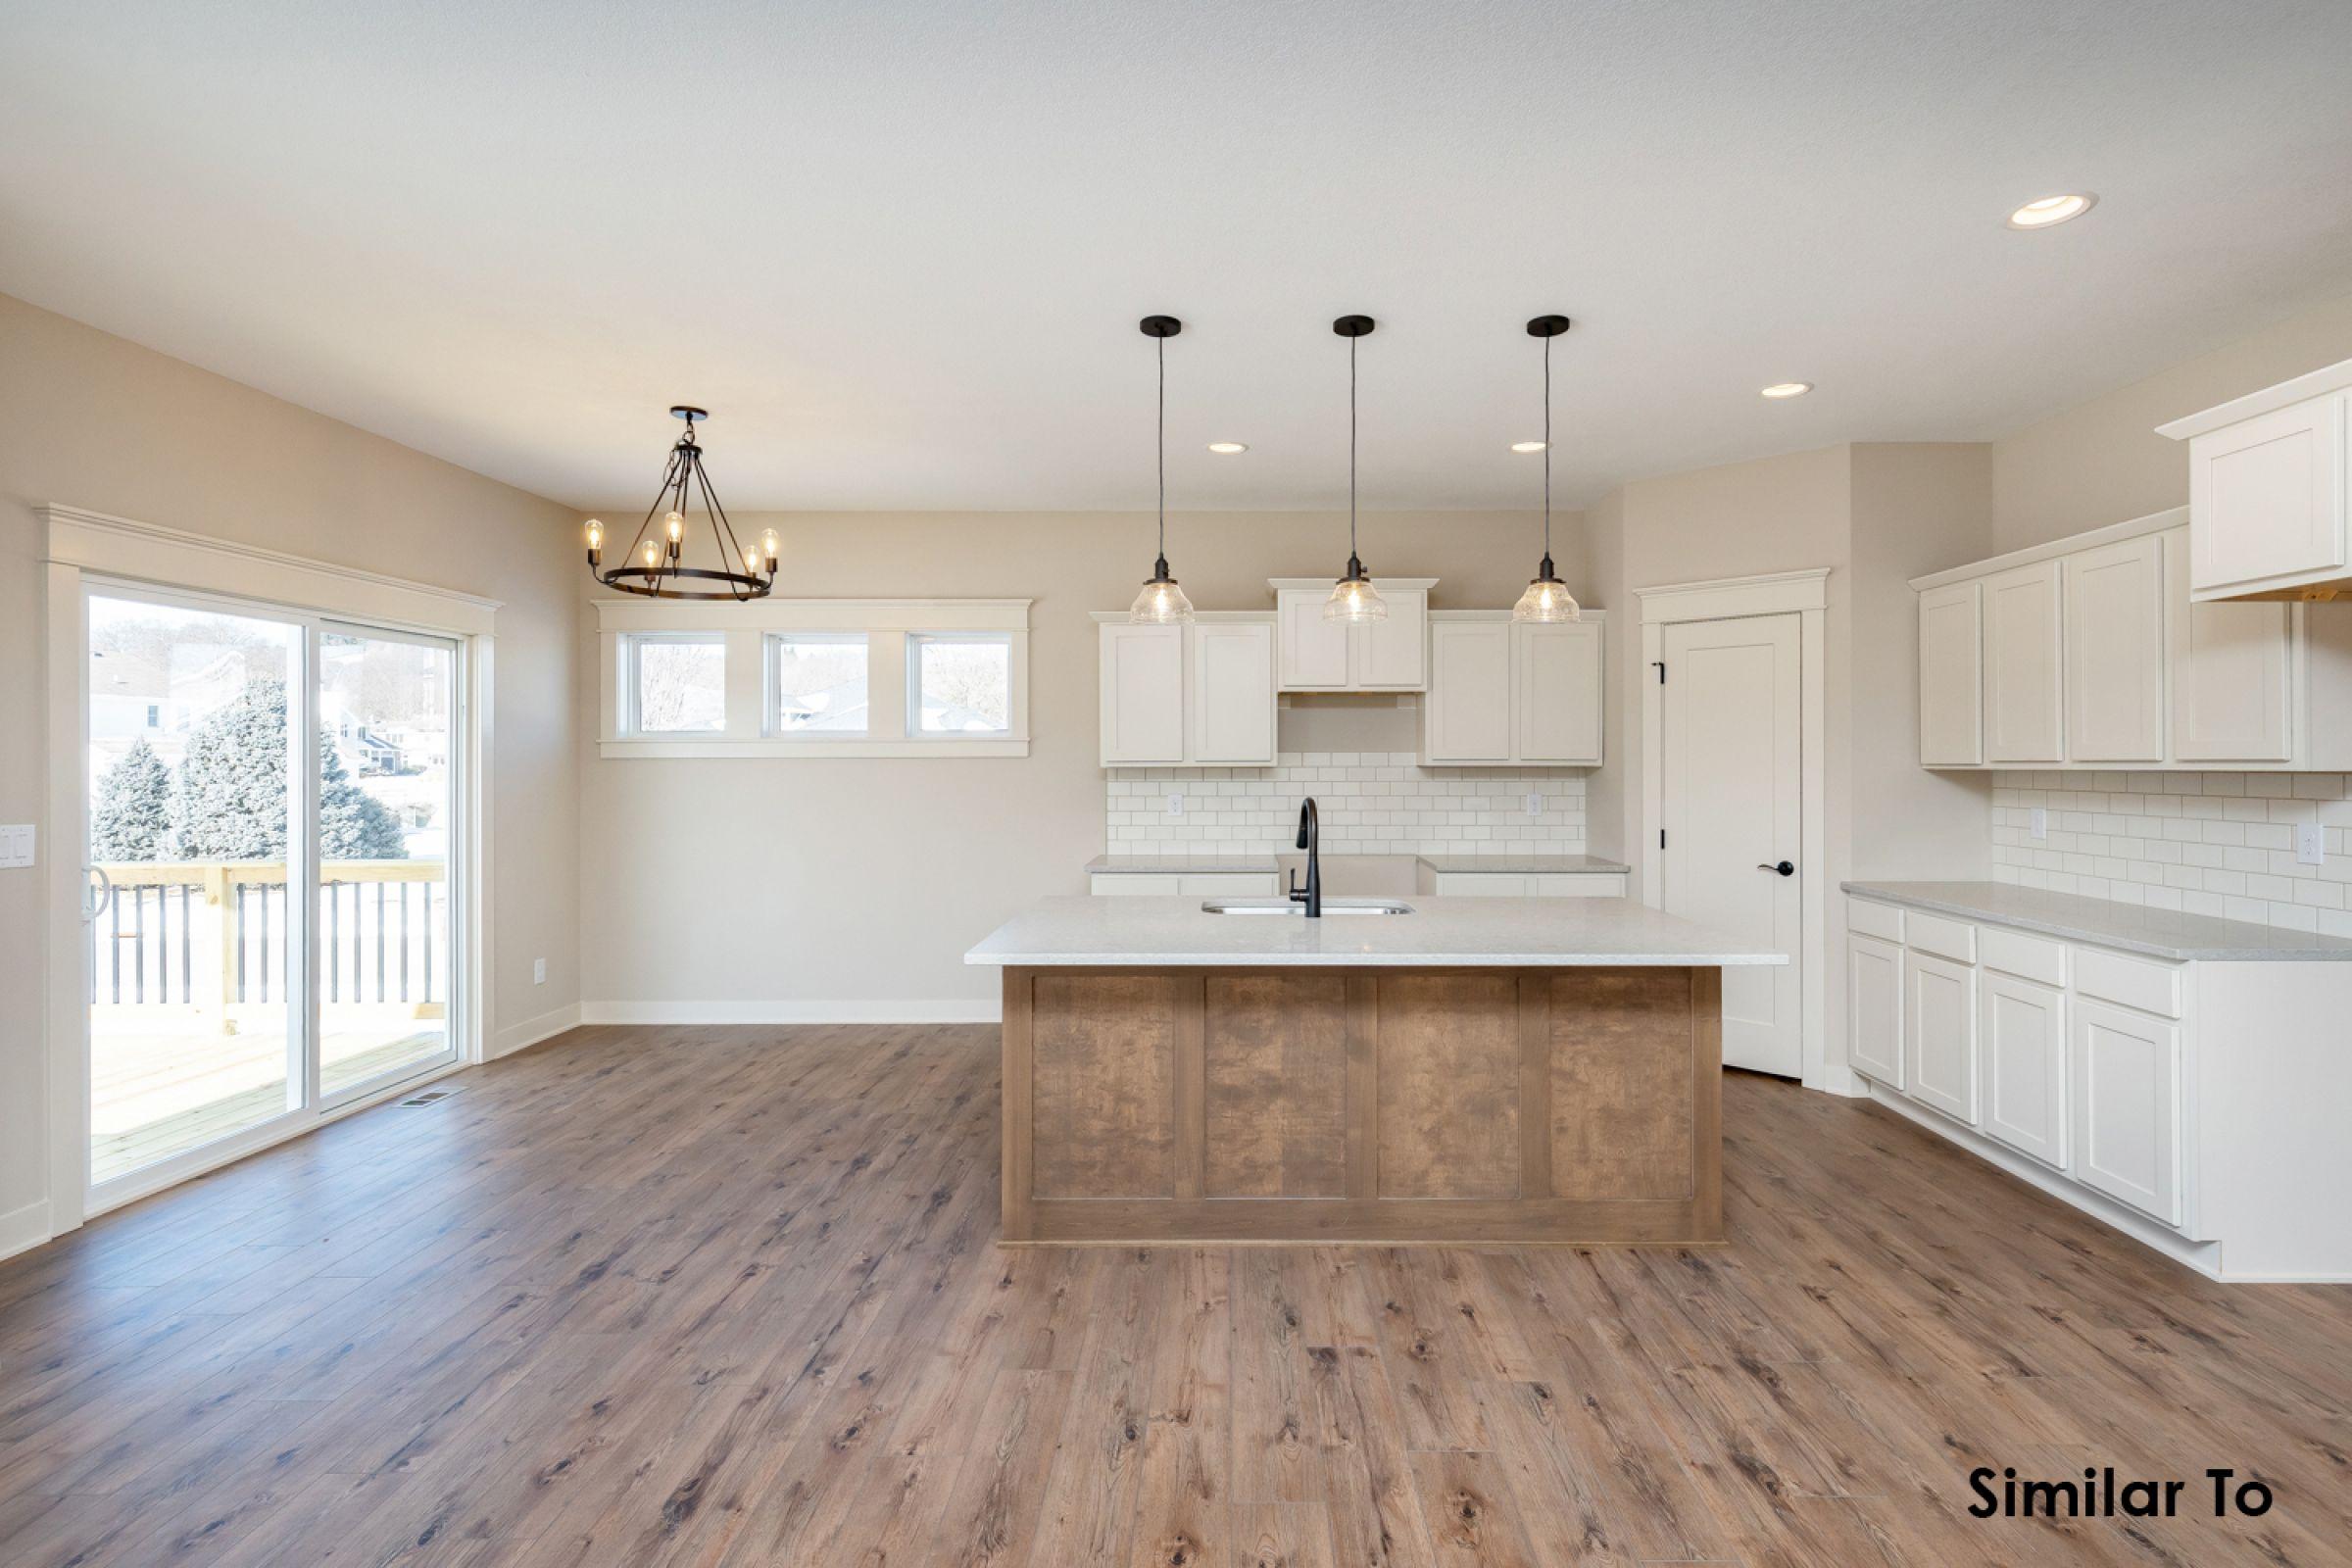 residential-warren-county-iowa-1-acres-listing-number-14995-3-2020-08-03-165347.jpg